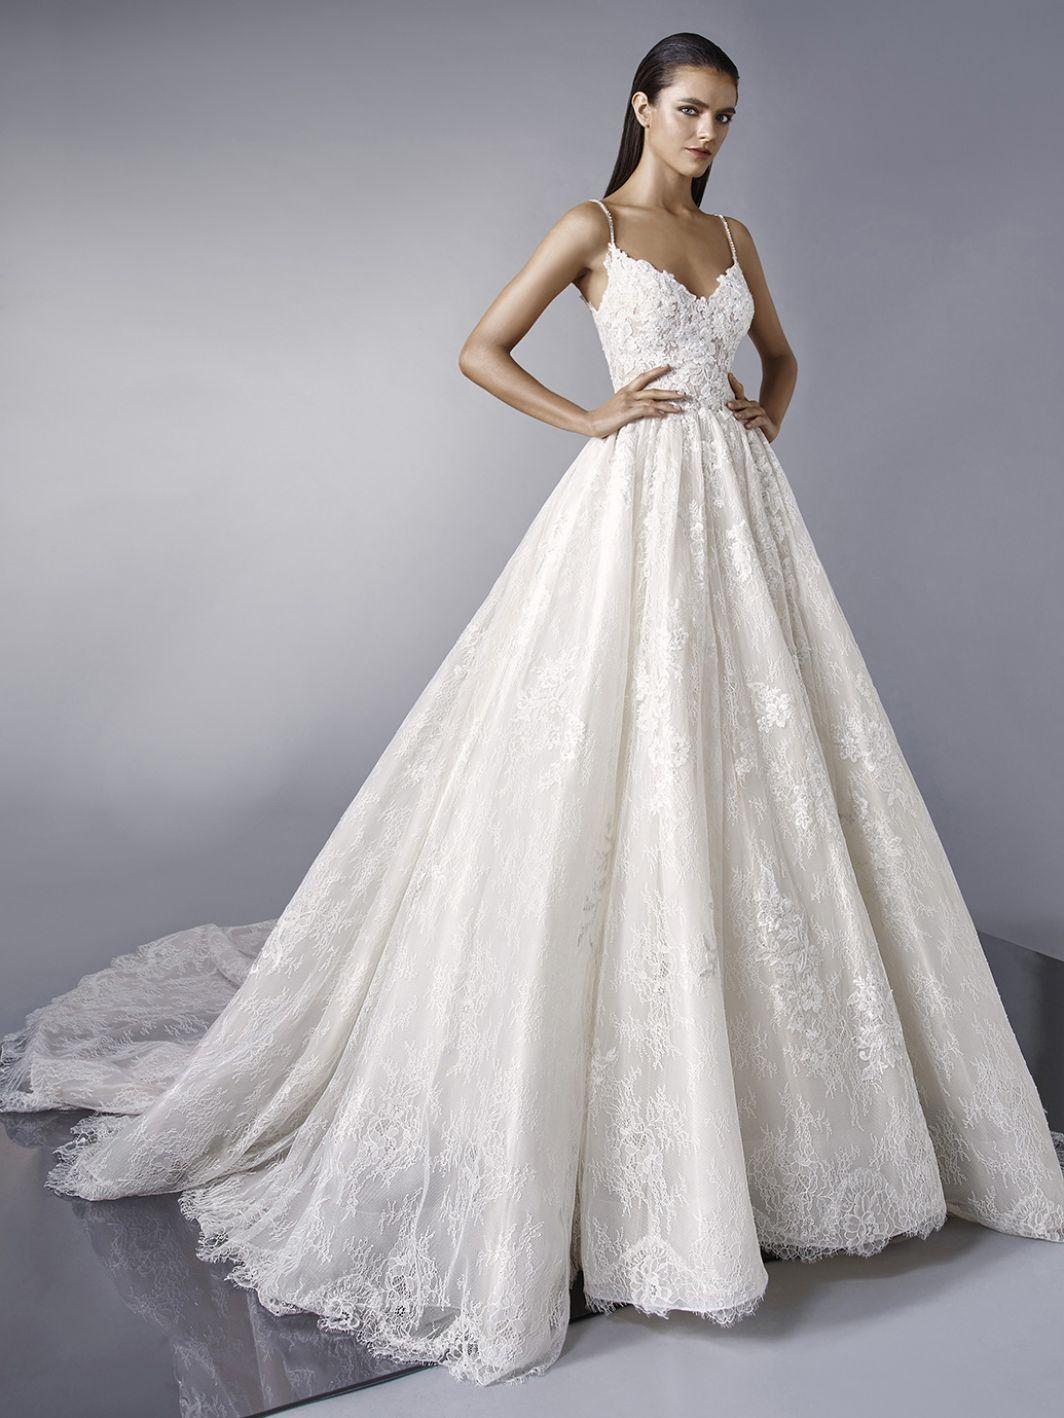 cool wedding dresses photo - 1